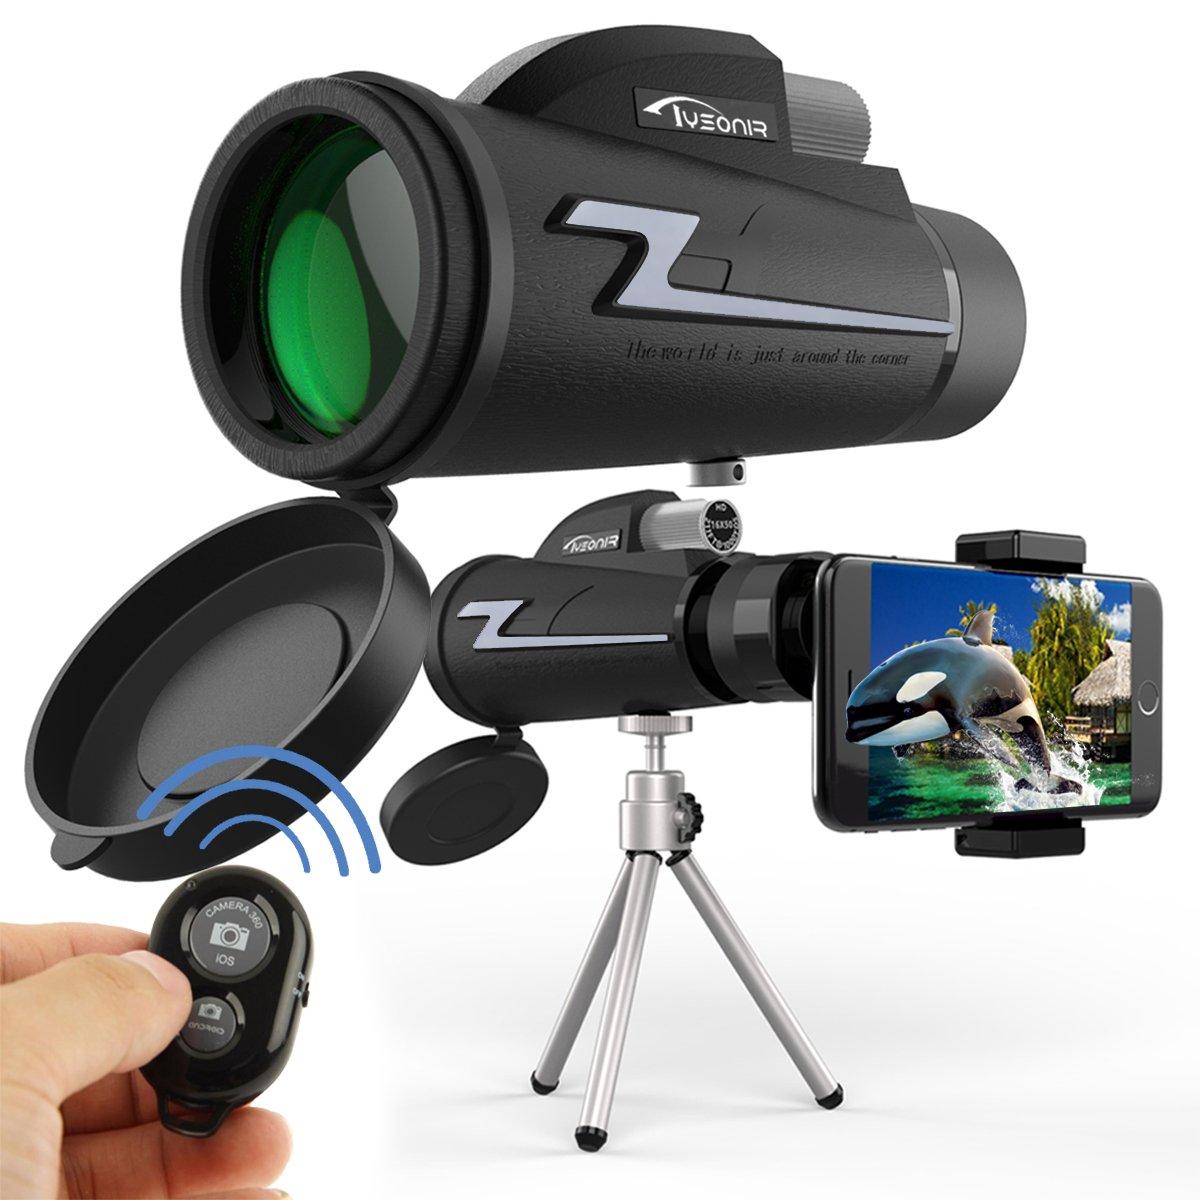 Tysonir 16x50 Monocular Telescope, High Powered Monocular Scope with Phone Adapter and Tripod, Waterproof Fogproof Optics FMC BAK4 Prisms for Bird Watching, Hunting, Camping, Hiking, Outdoor